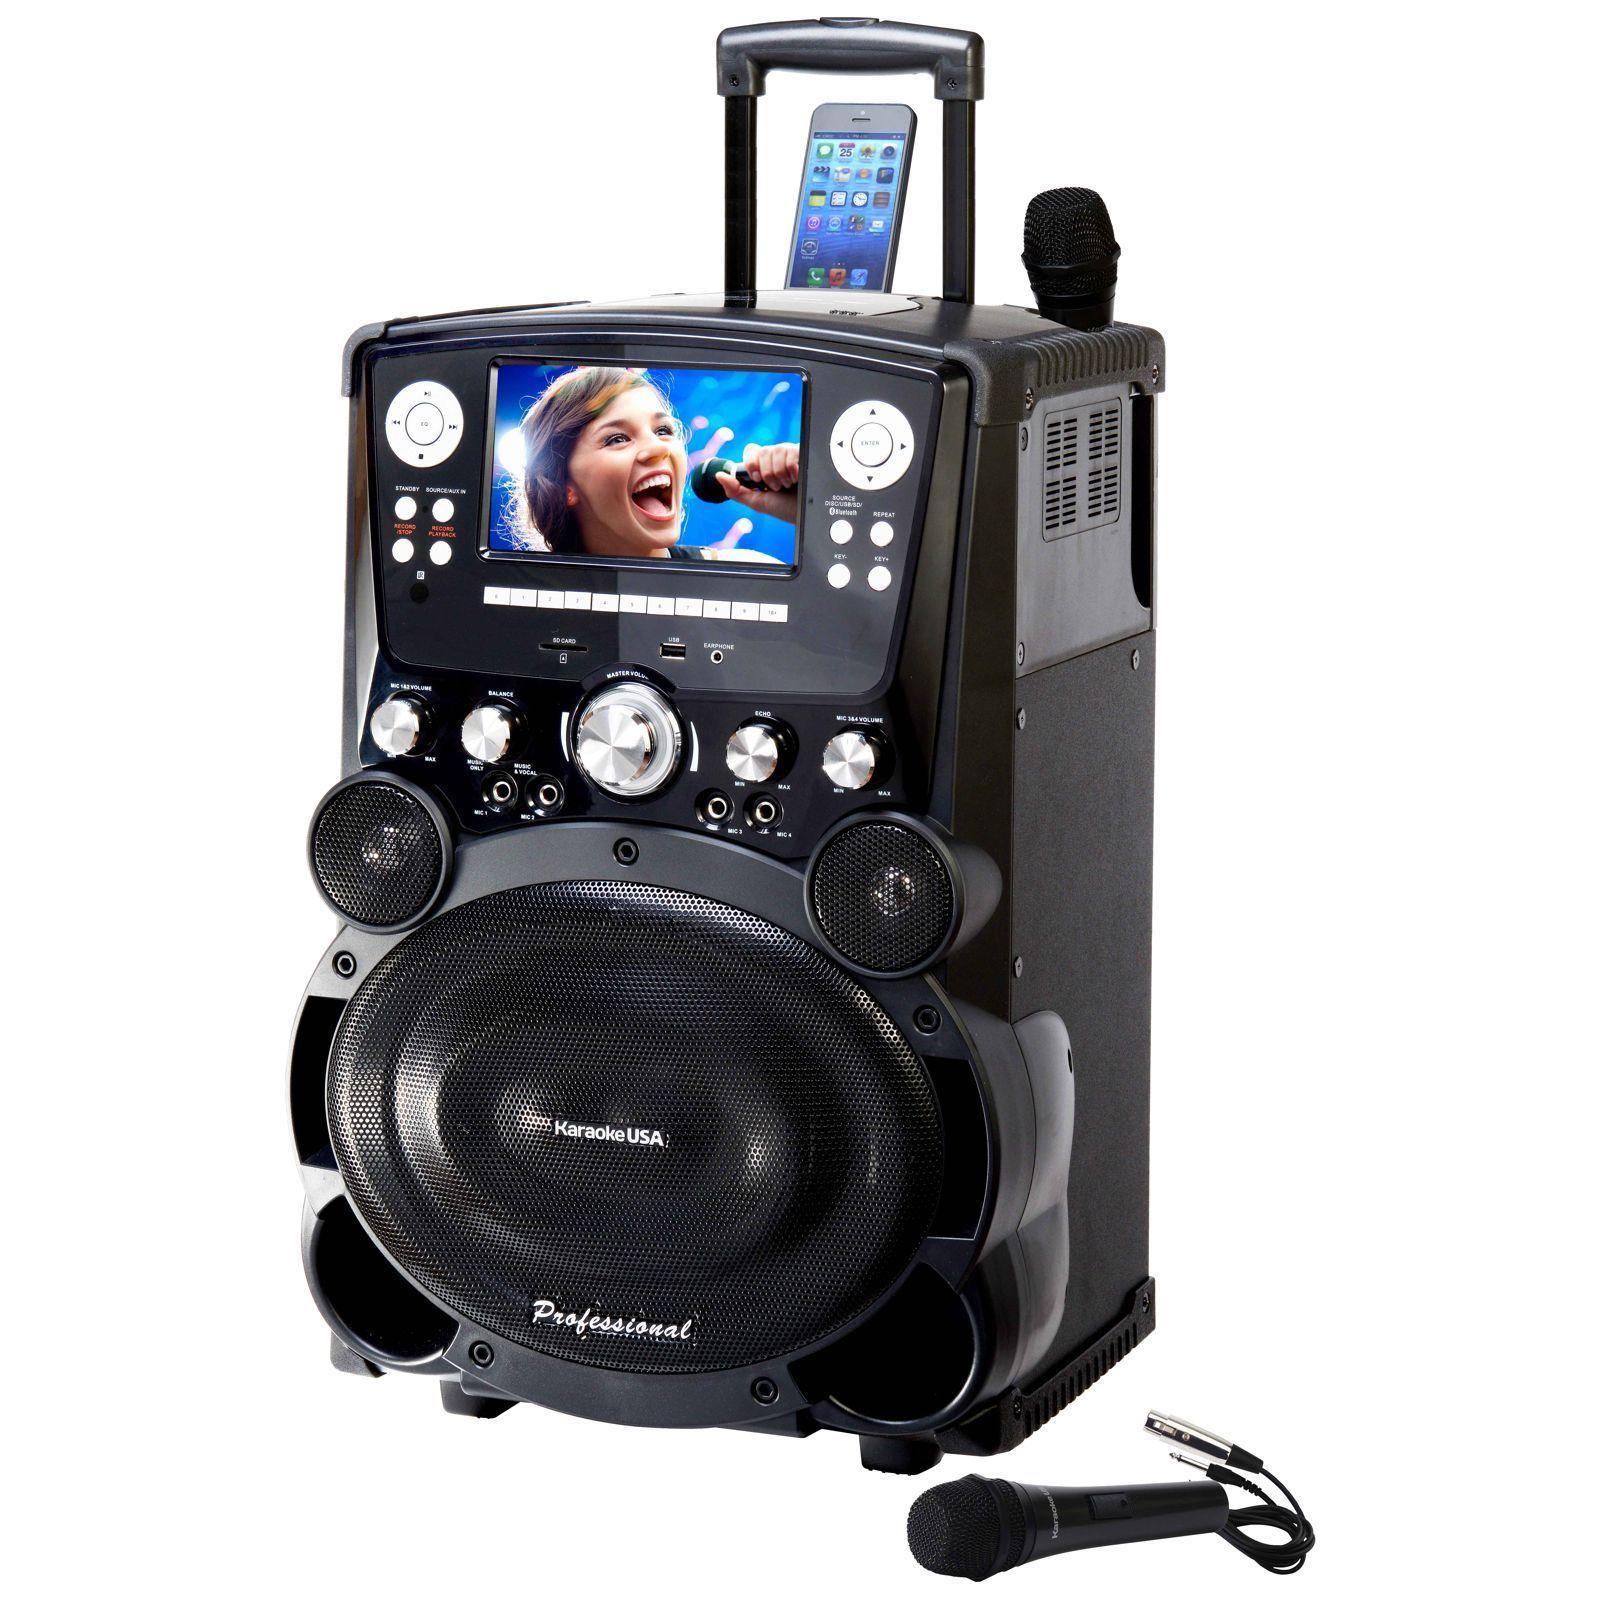 Karaoke USA GP978 Professional DVD/CDG/MP3G Karaoke Player #karaokeplayer Karaoke USA GP978 Professional DVD/CDG/MP3G Karaoke Player | MaxStrata #karaokeplayer